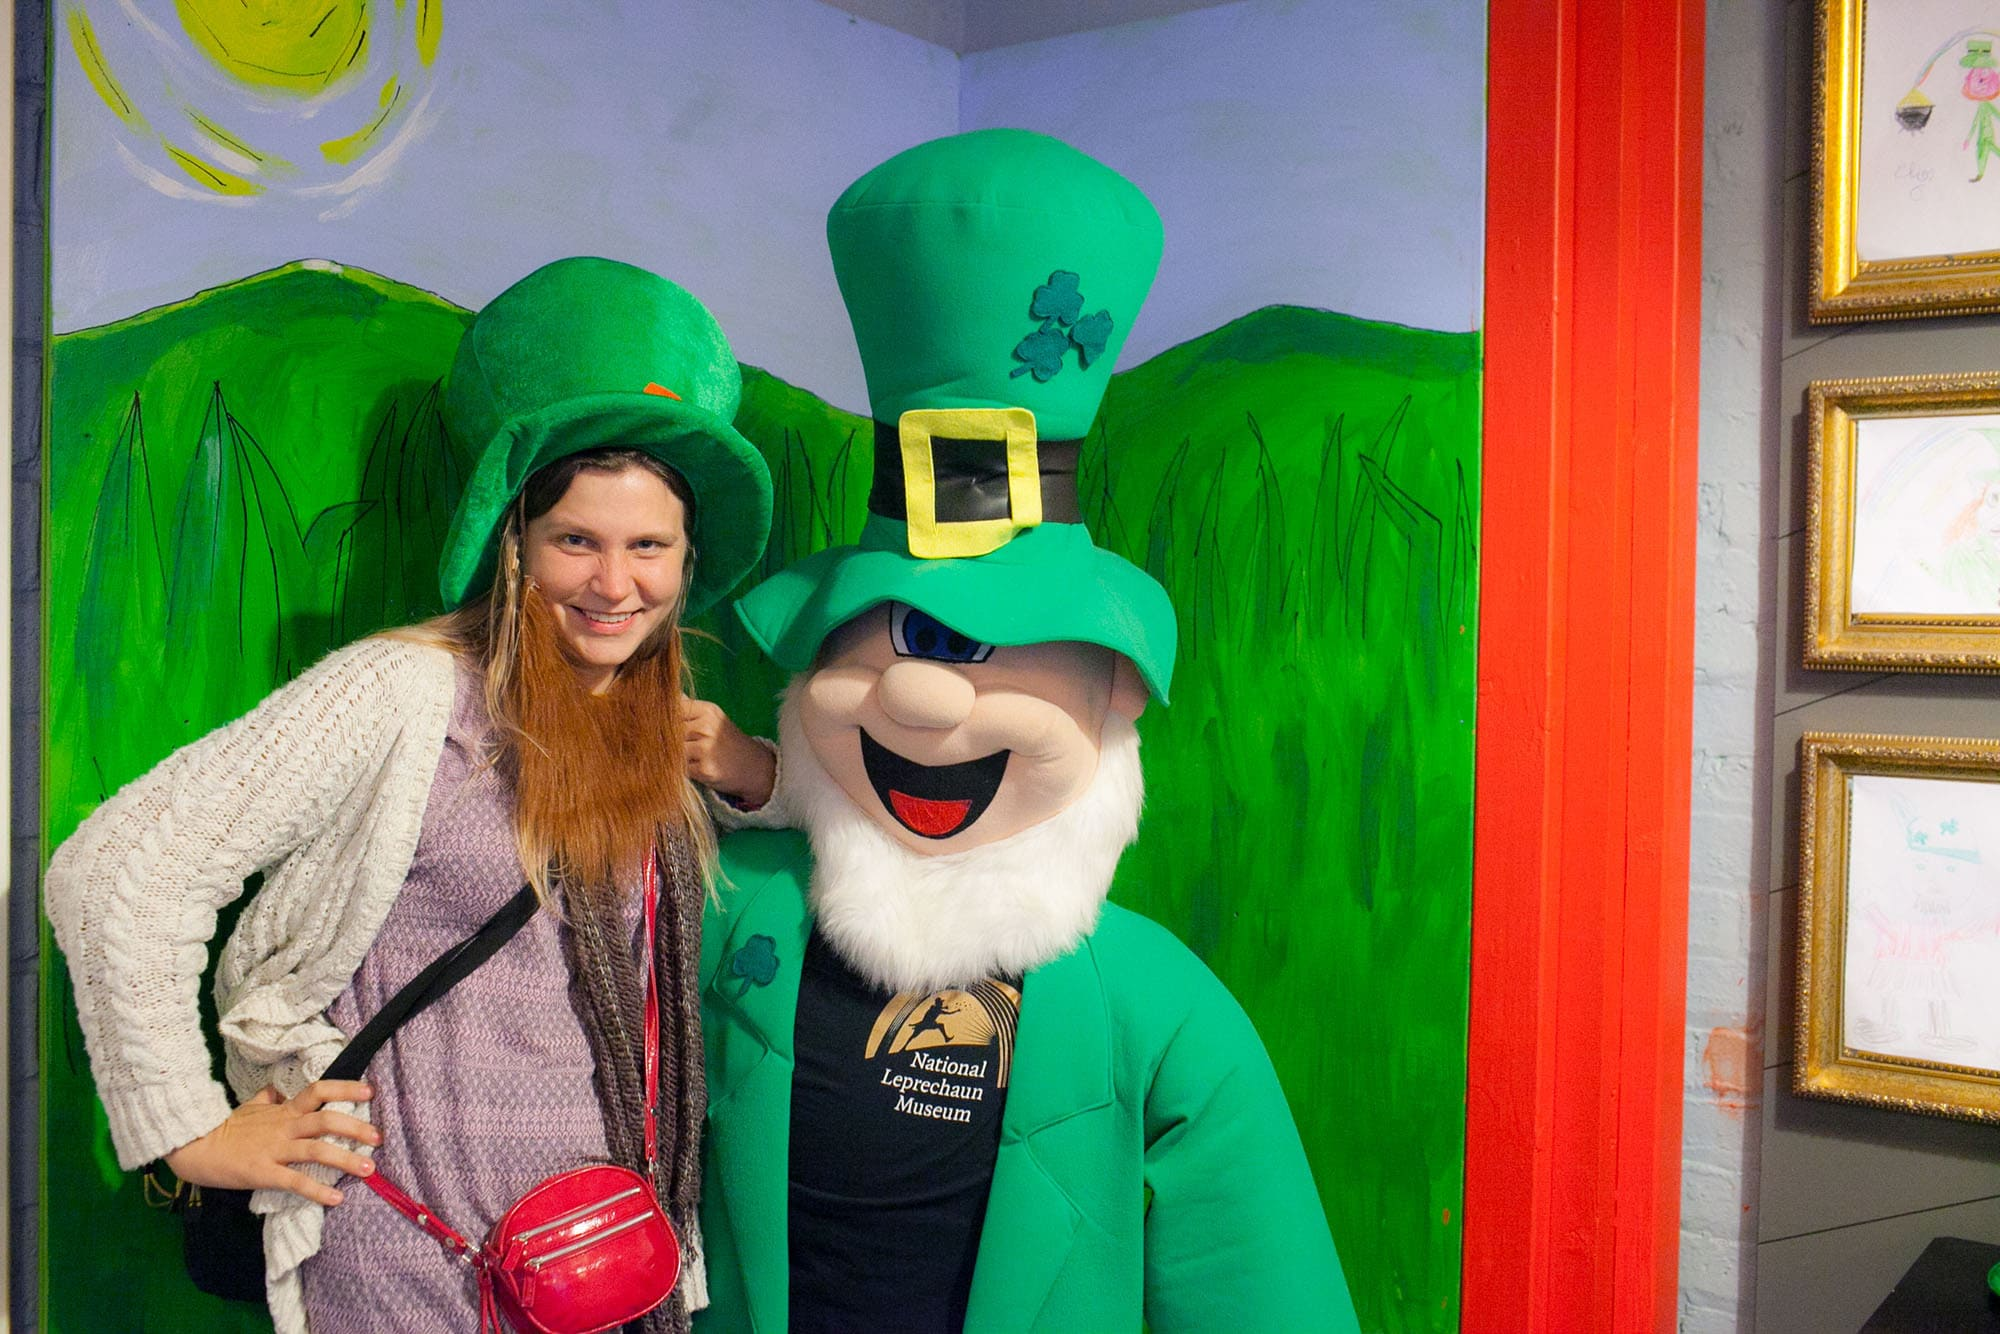 With a leprechaun at the National Leprechaun Museum in Dublin, Ireland